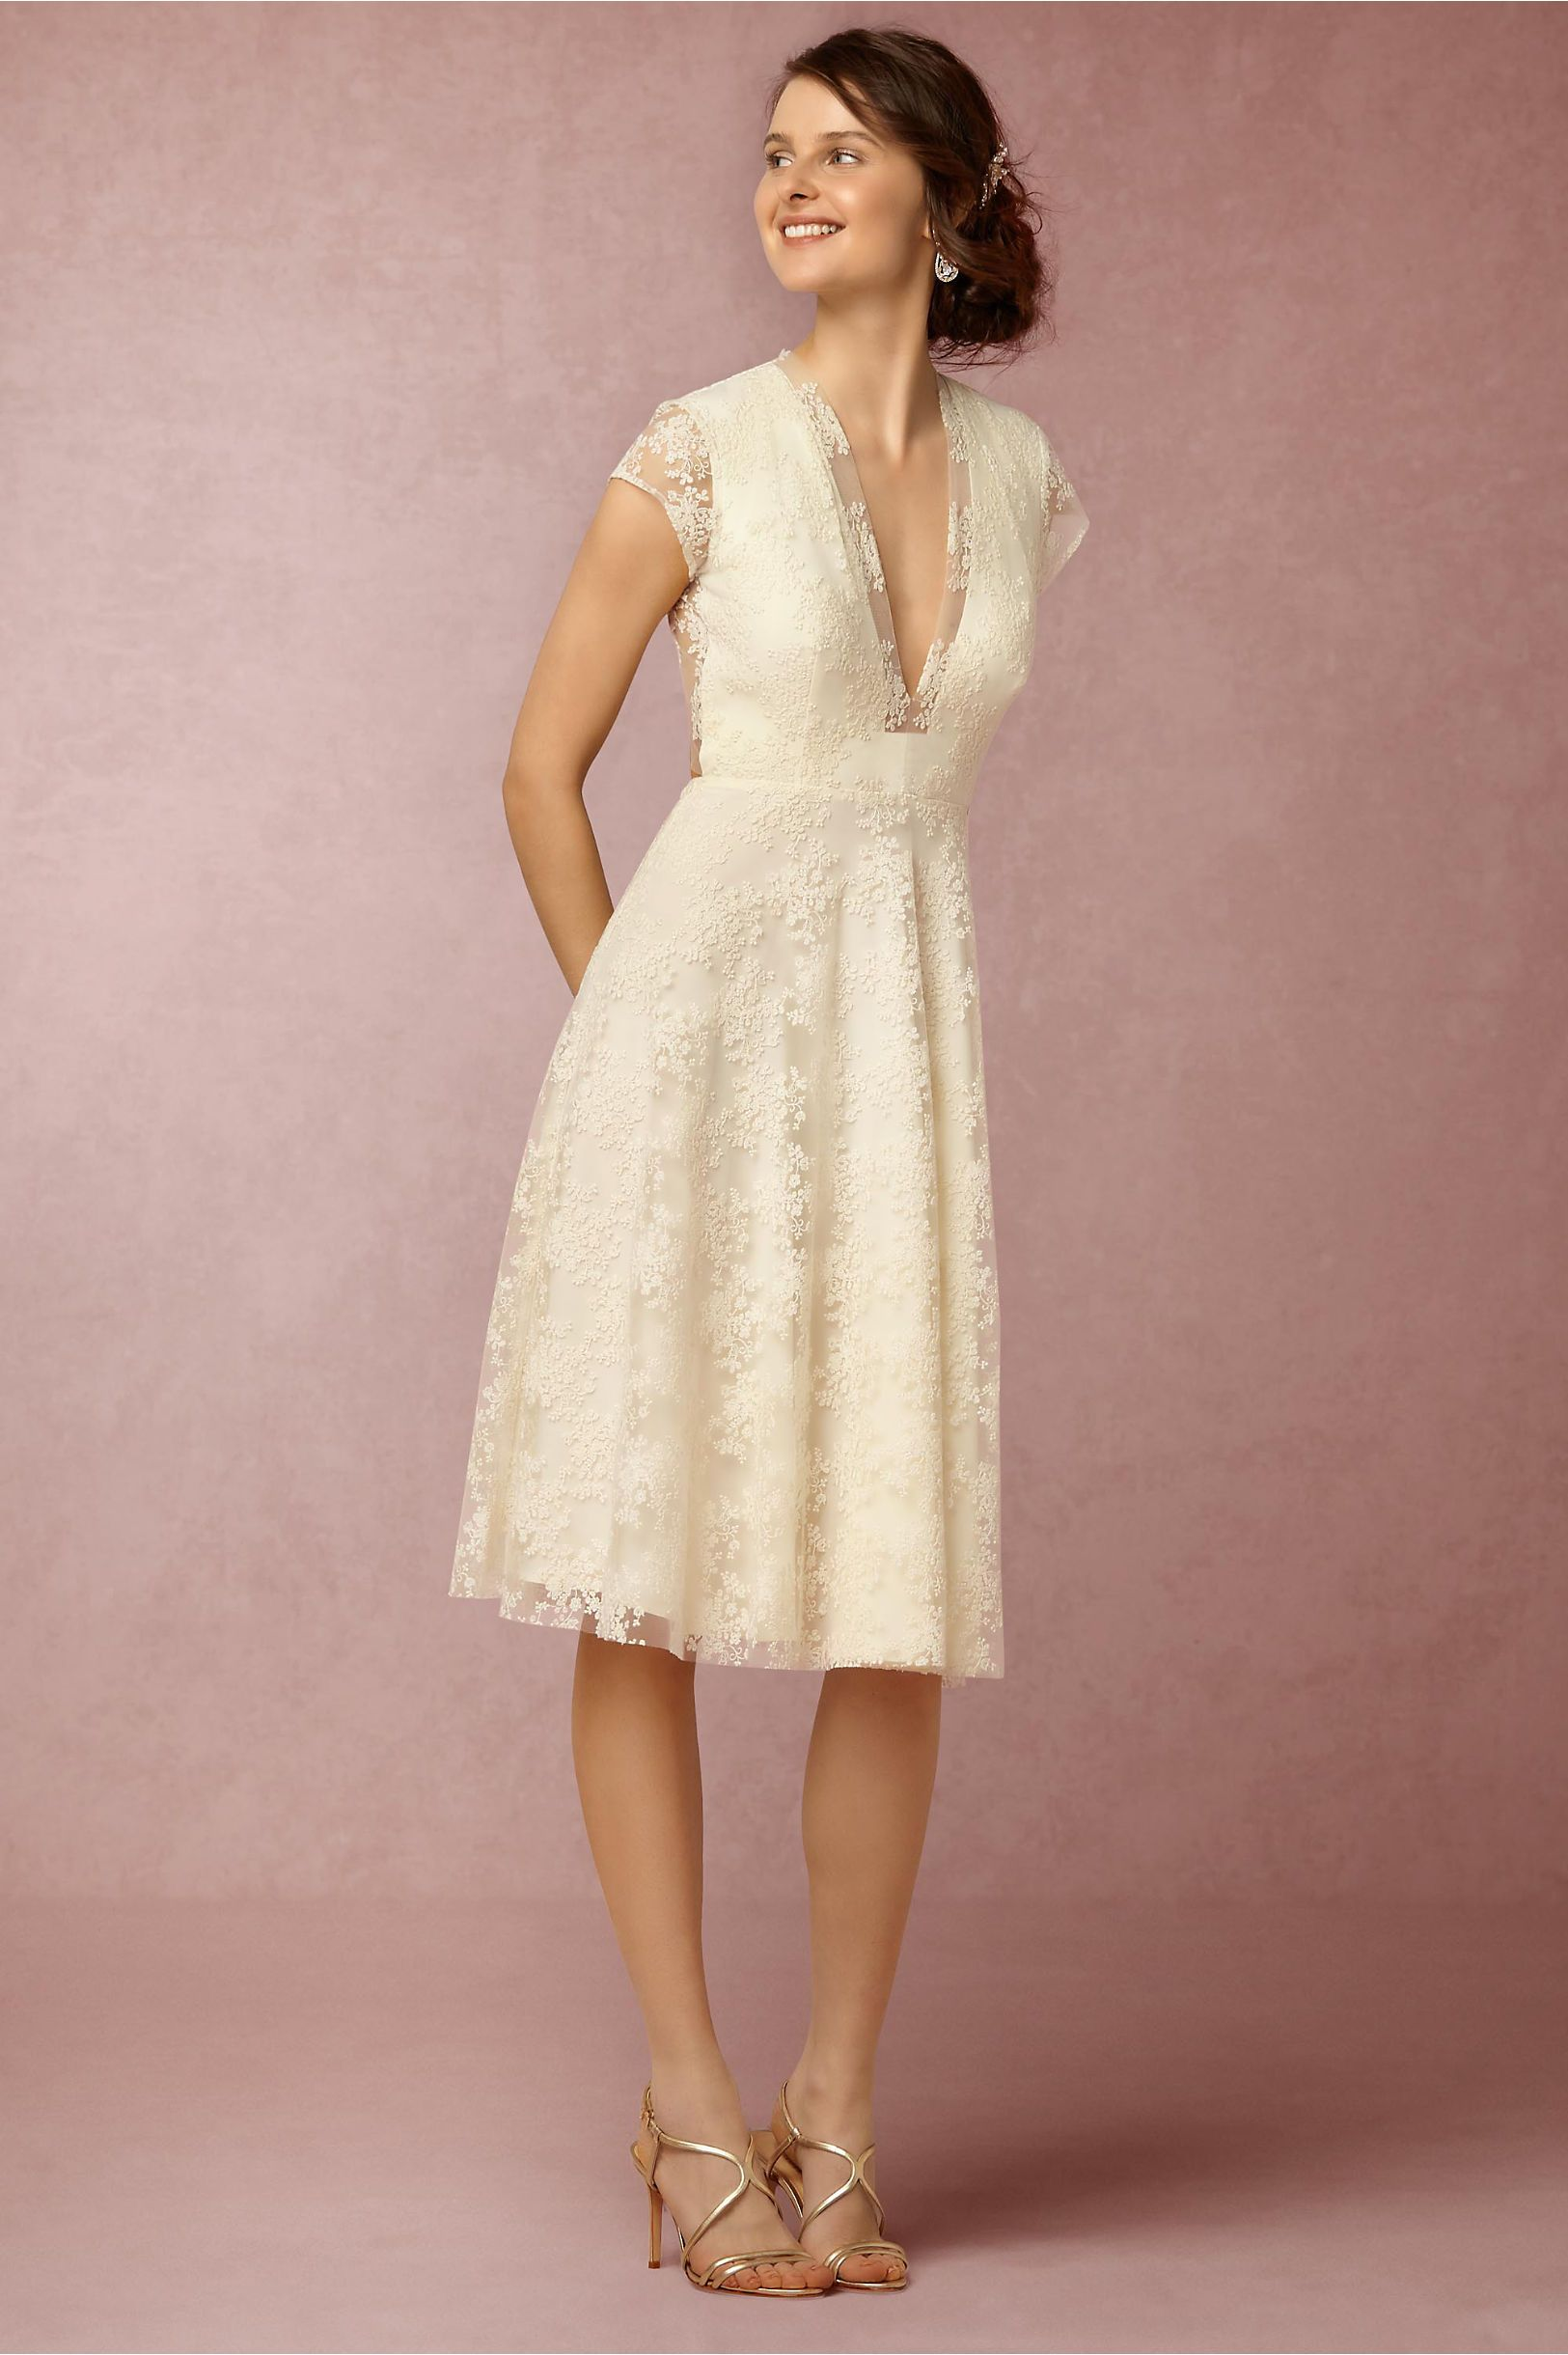 BHLDN Aaliyah Dress in Bride Reception & Rehearsal Dresses at ...